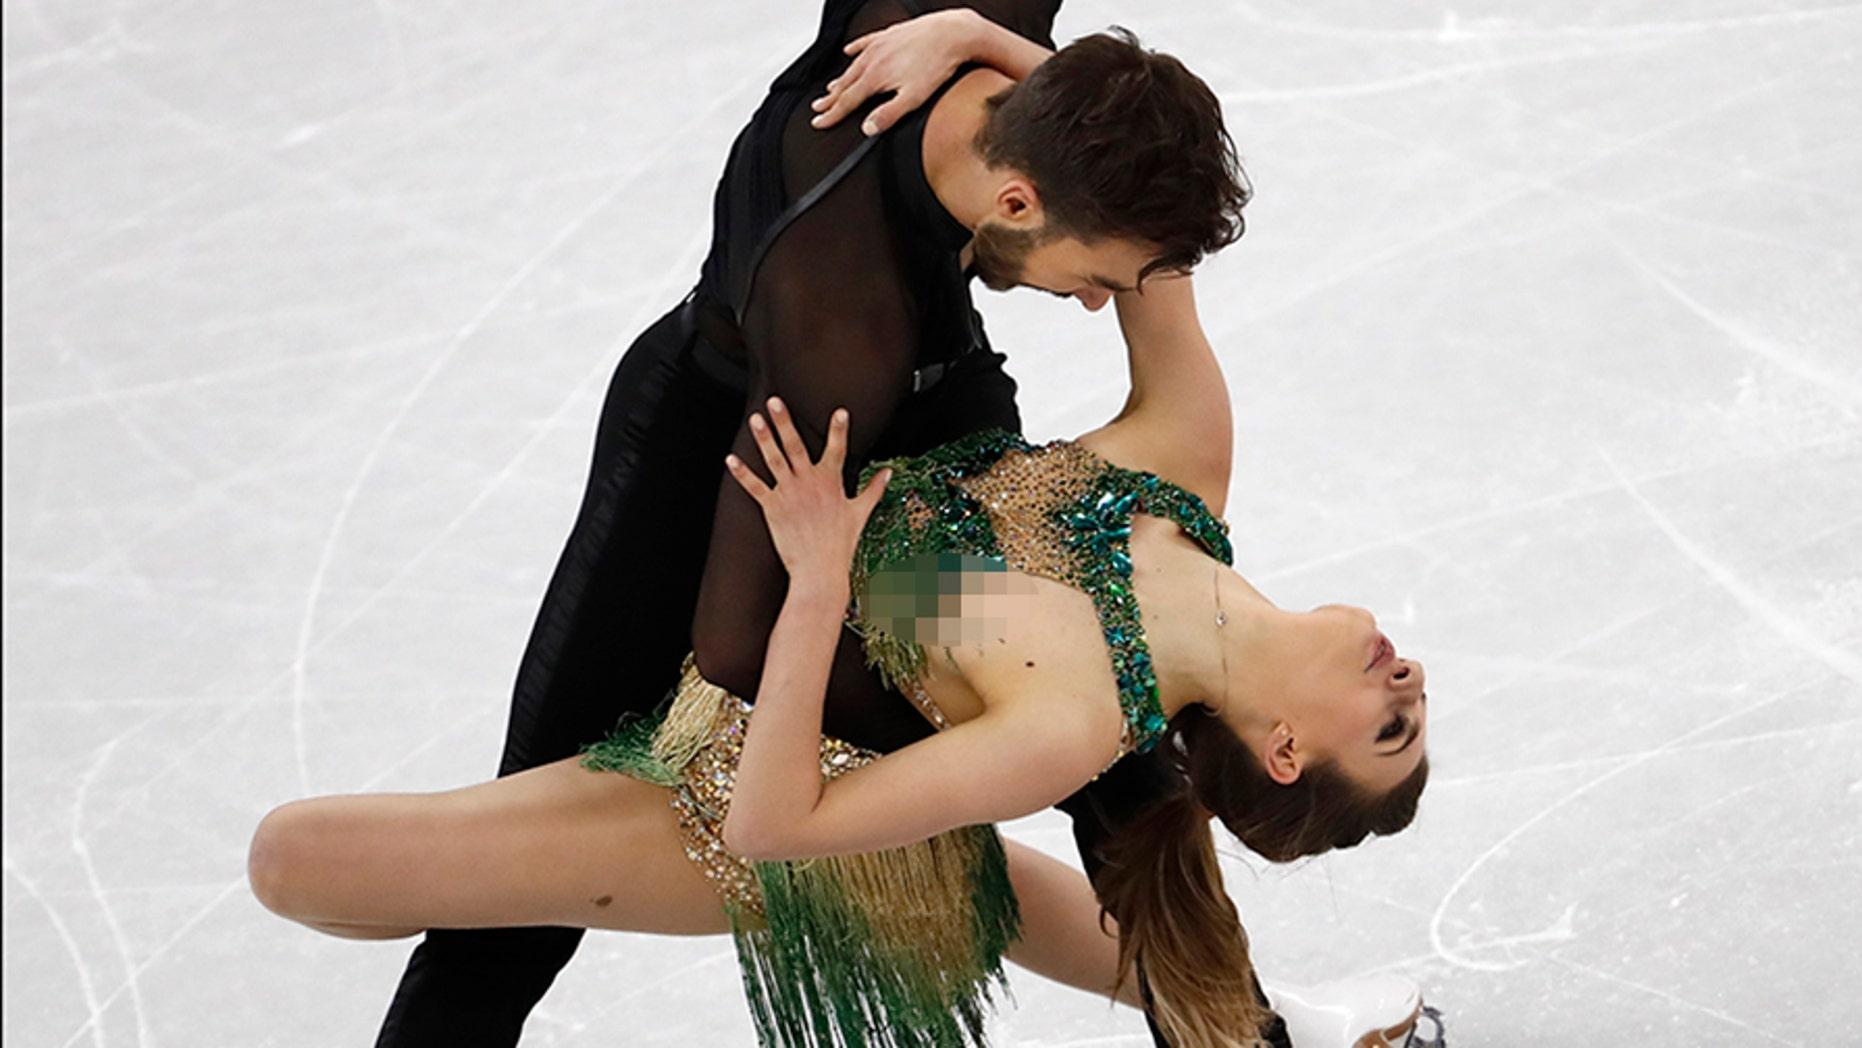 Gabriella Papadakis had a wardrobe malfunction during her short program with partner Guillaume Cizeron